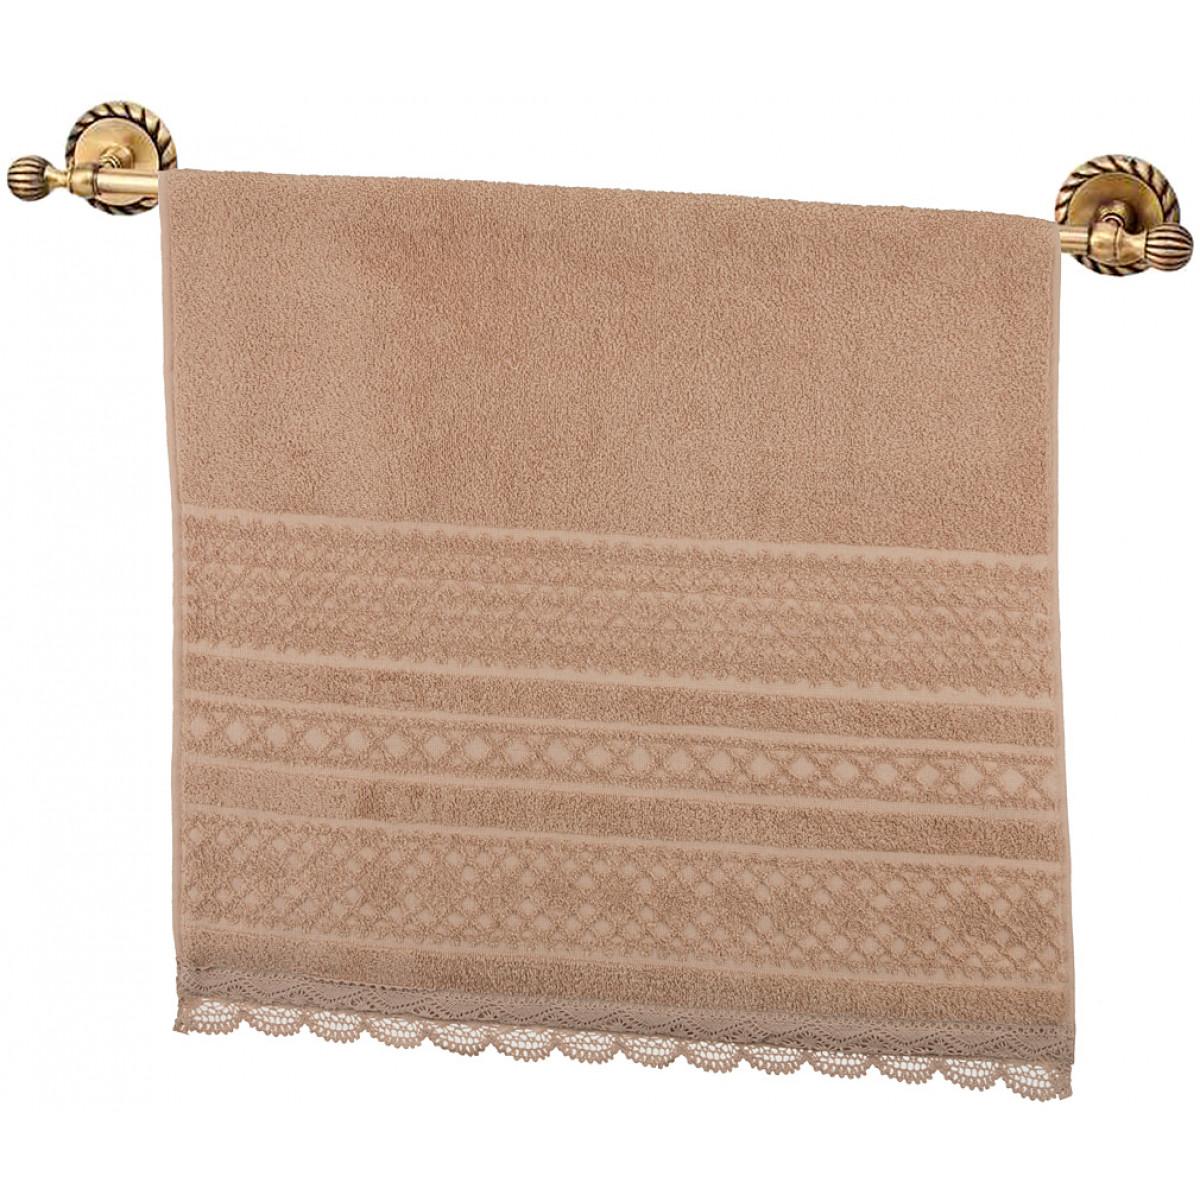 Полотенца Santalino Полотенце Claramae  (50х90 см) полотенца банные la pastel полотенце кружево 50х90 см